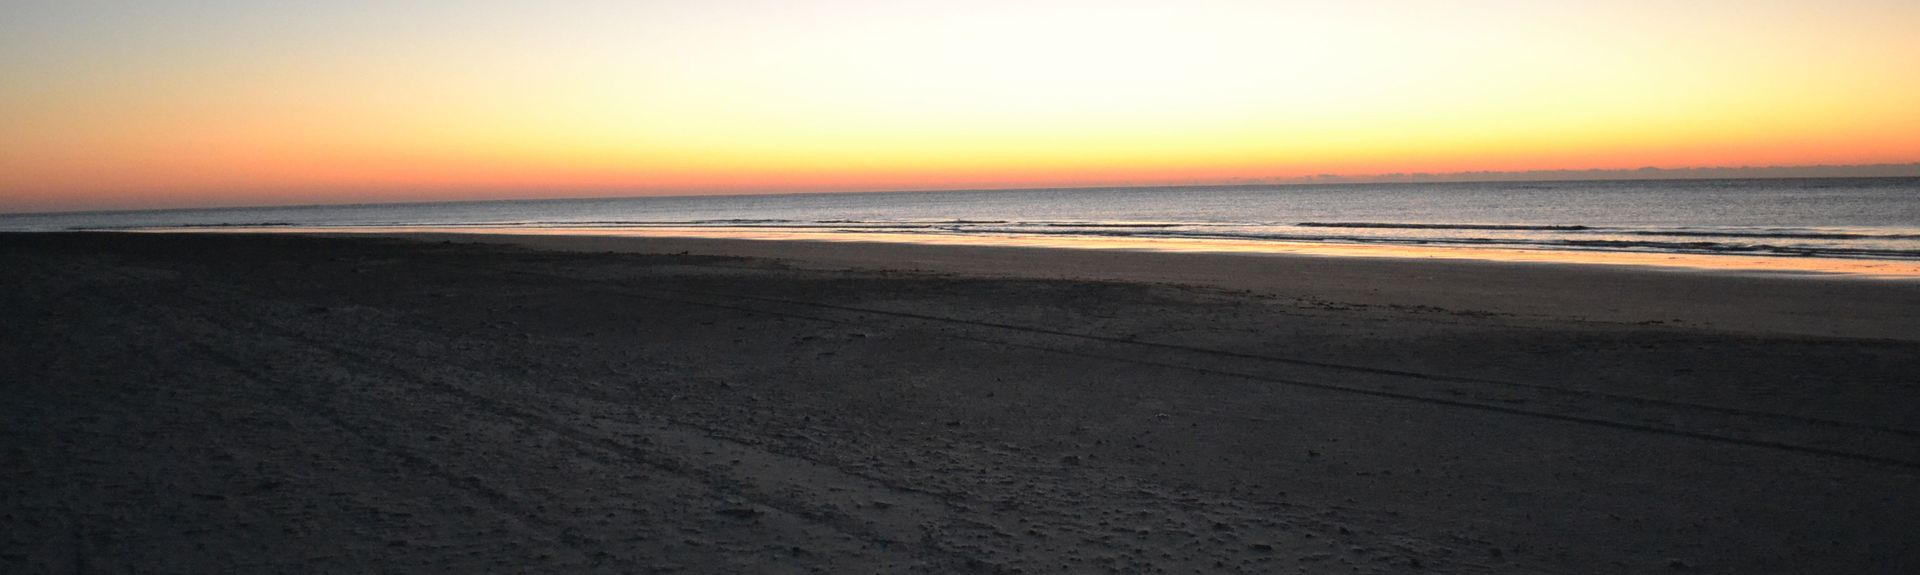 Mariners Walk, Wild Dunes, Isle of Palms, SC, USA